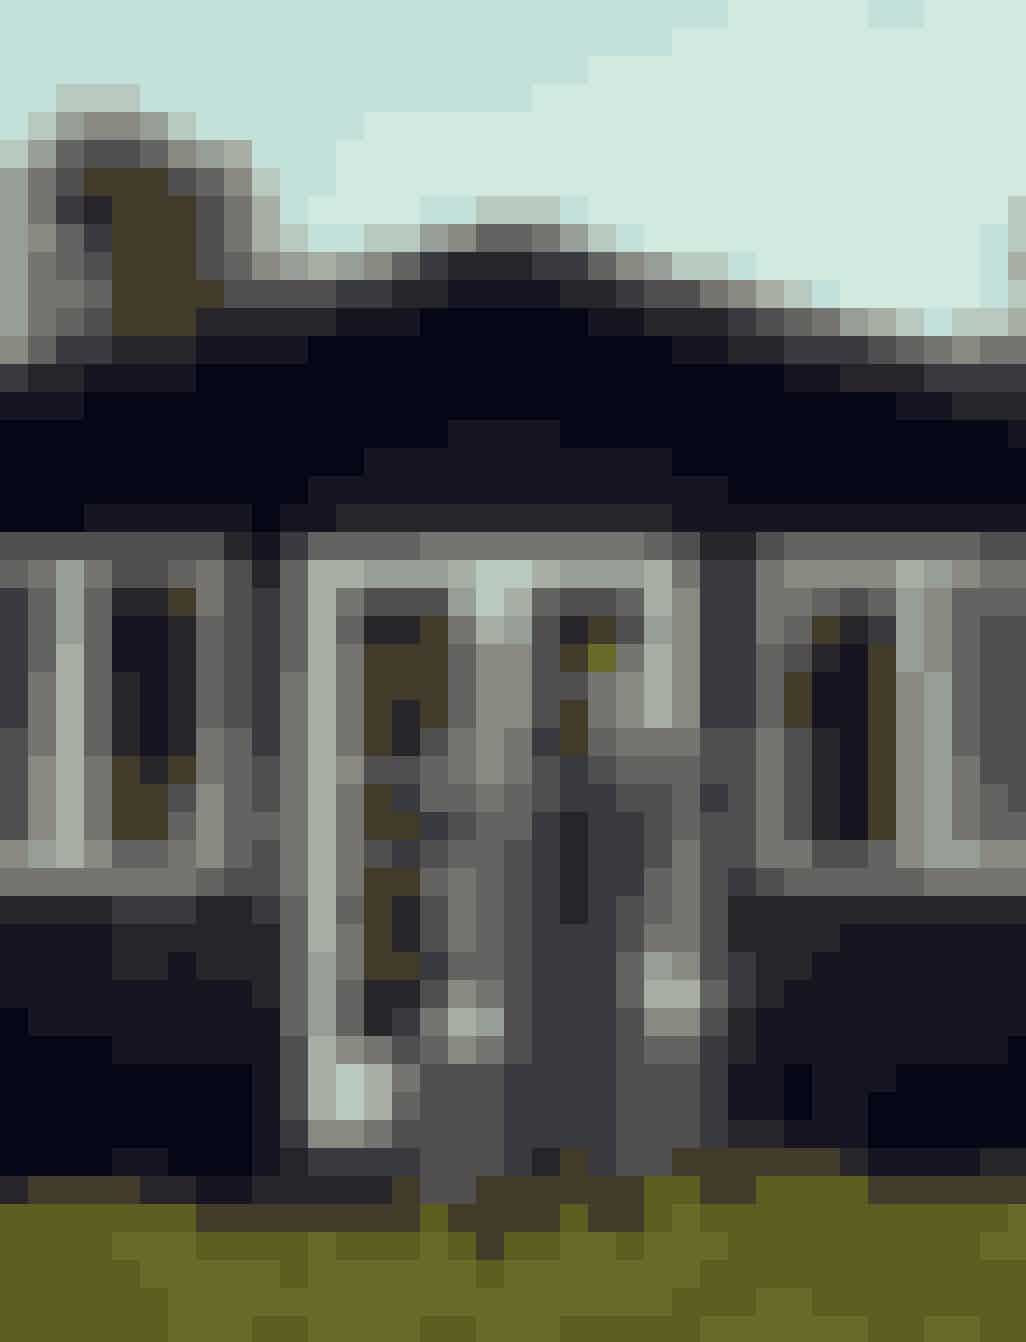 HELENE SCHJERBECK& SIMONE BENDIX50 år, tvillinger og designere. Simone er uddannet skuespillerinde, bosat i Paris. Helene er arkitekt, bosat i Toscana. De har sammen lædervaremærket Edition Poshette med finurlige accessories. Har denne sommer dekoreret samt renoveret lejrskolen Høve Hus i Odsherred.Se mere på Editionposhette.com,@editionposhette og Lejrskolen.dk